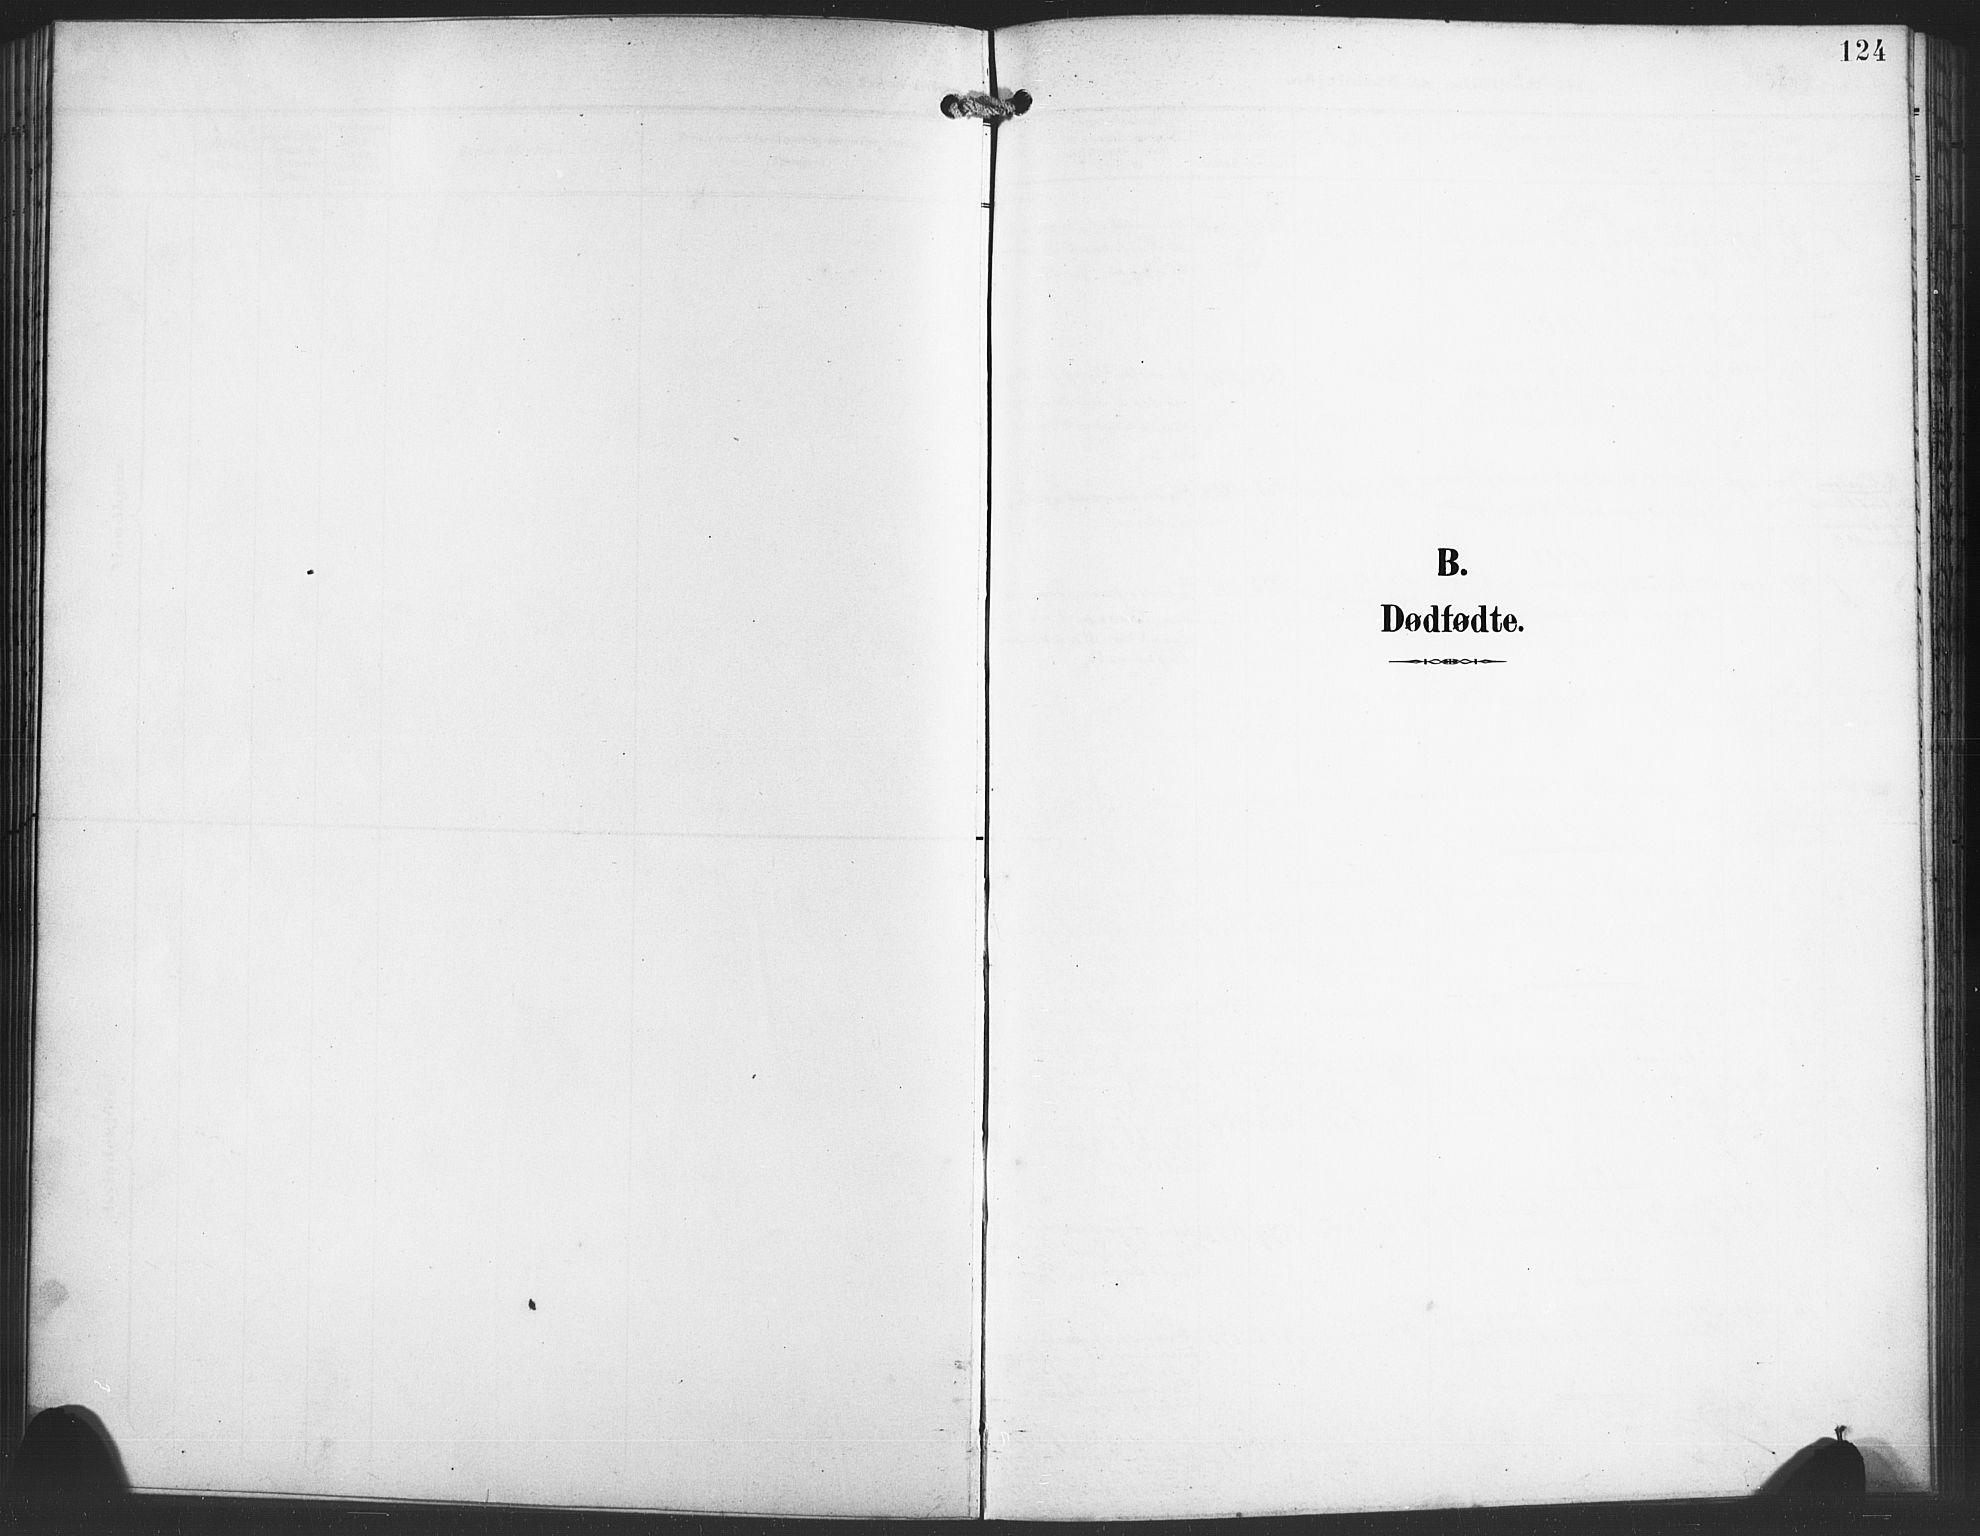 SAB, Evanger sokneprestembete*, Parish register (copy) no. A 5, 1897-1917, p. 124